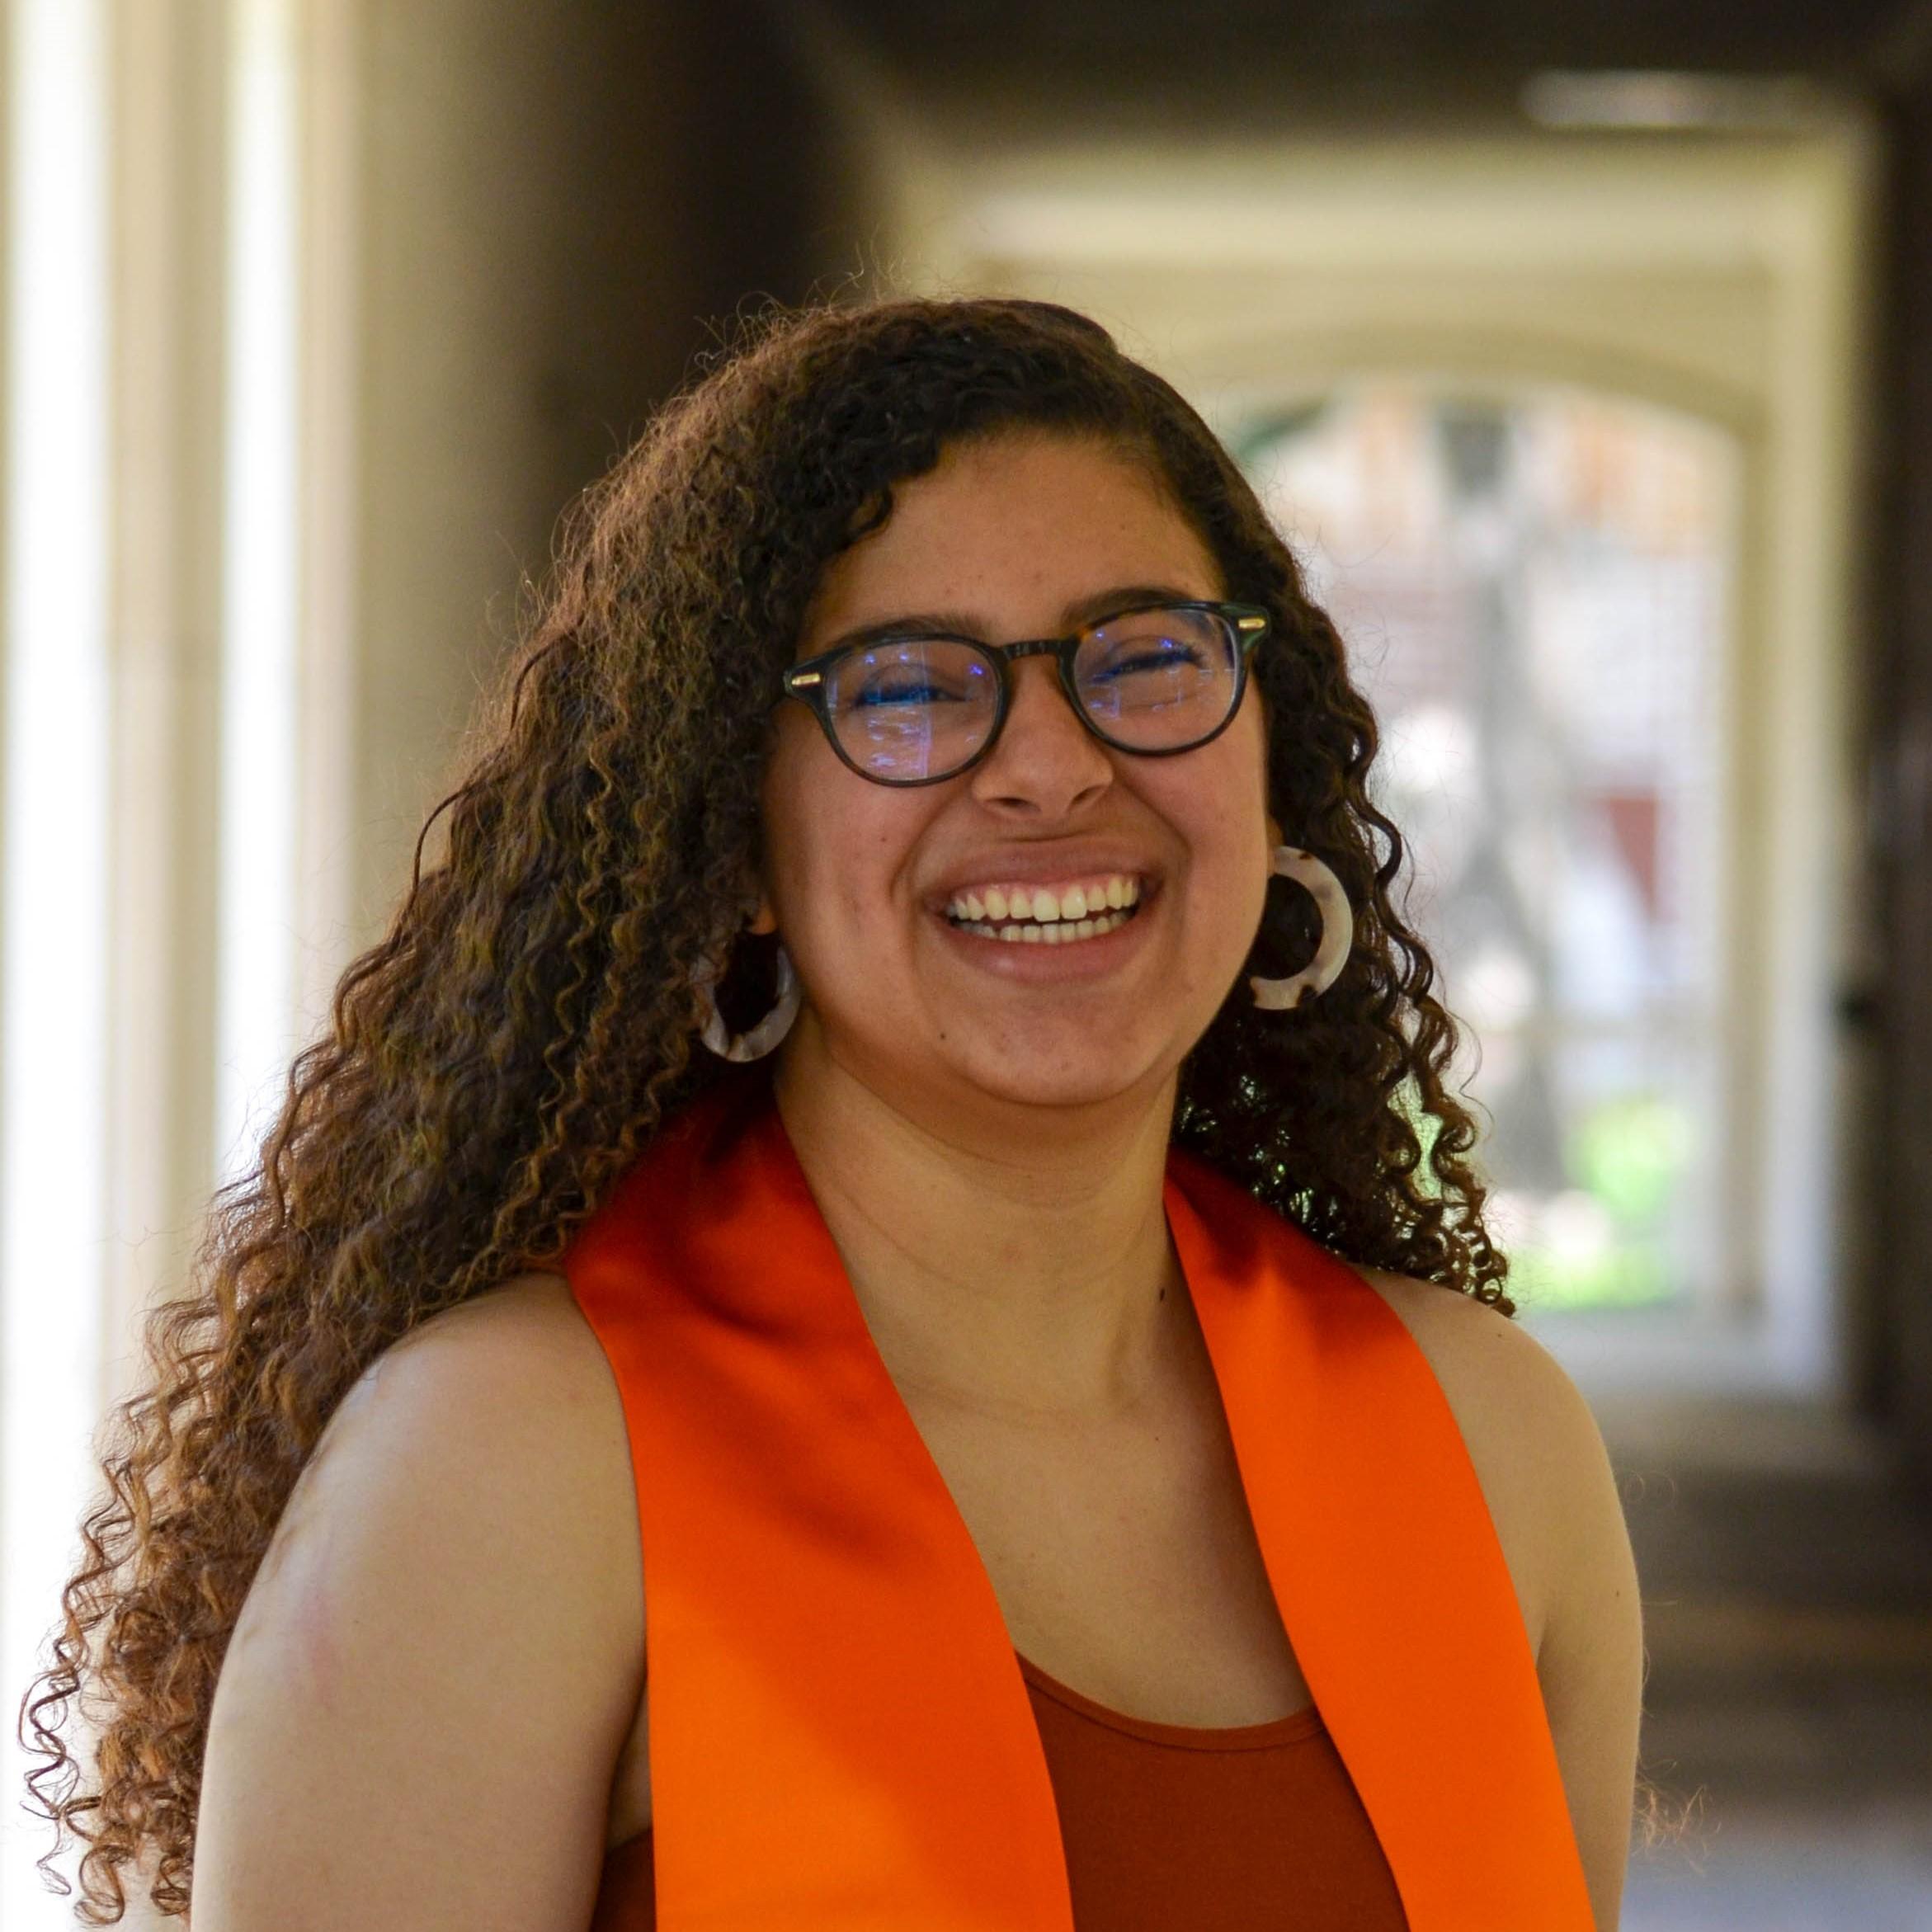 BioE PhD student Susana Simmonds